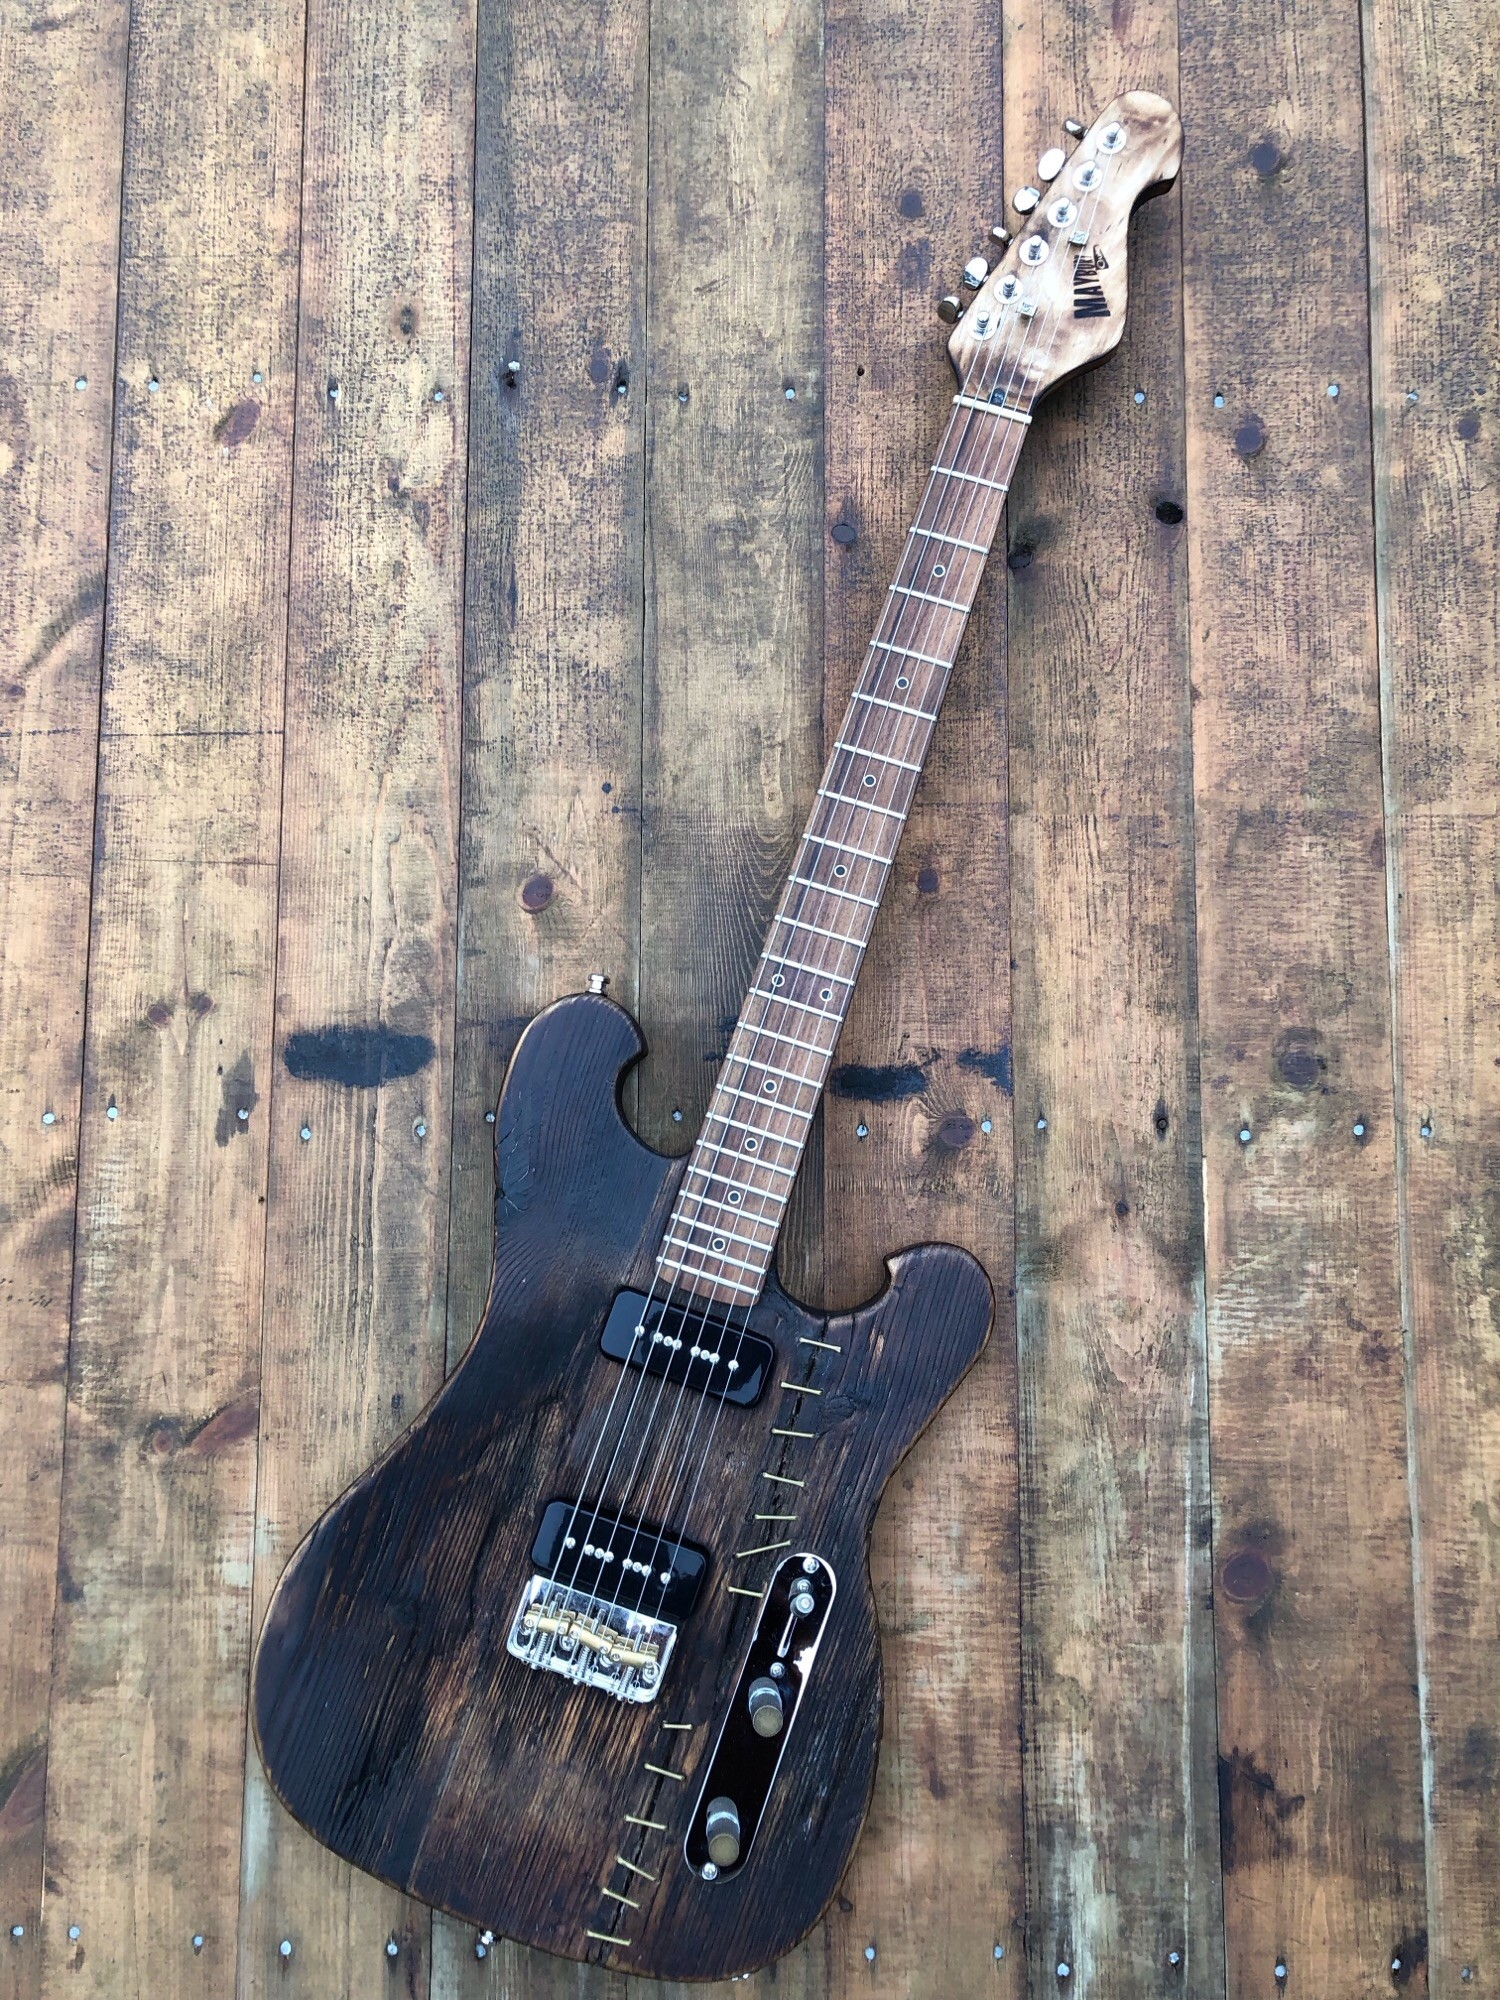 Recyled Guitar.jpg